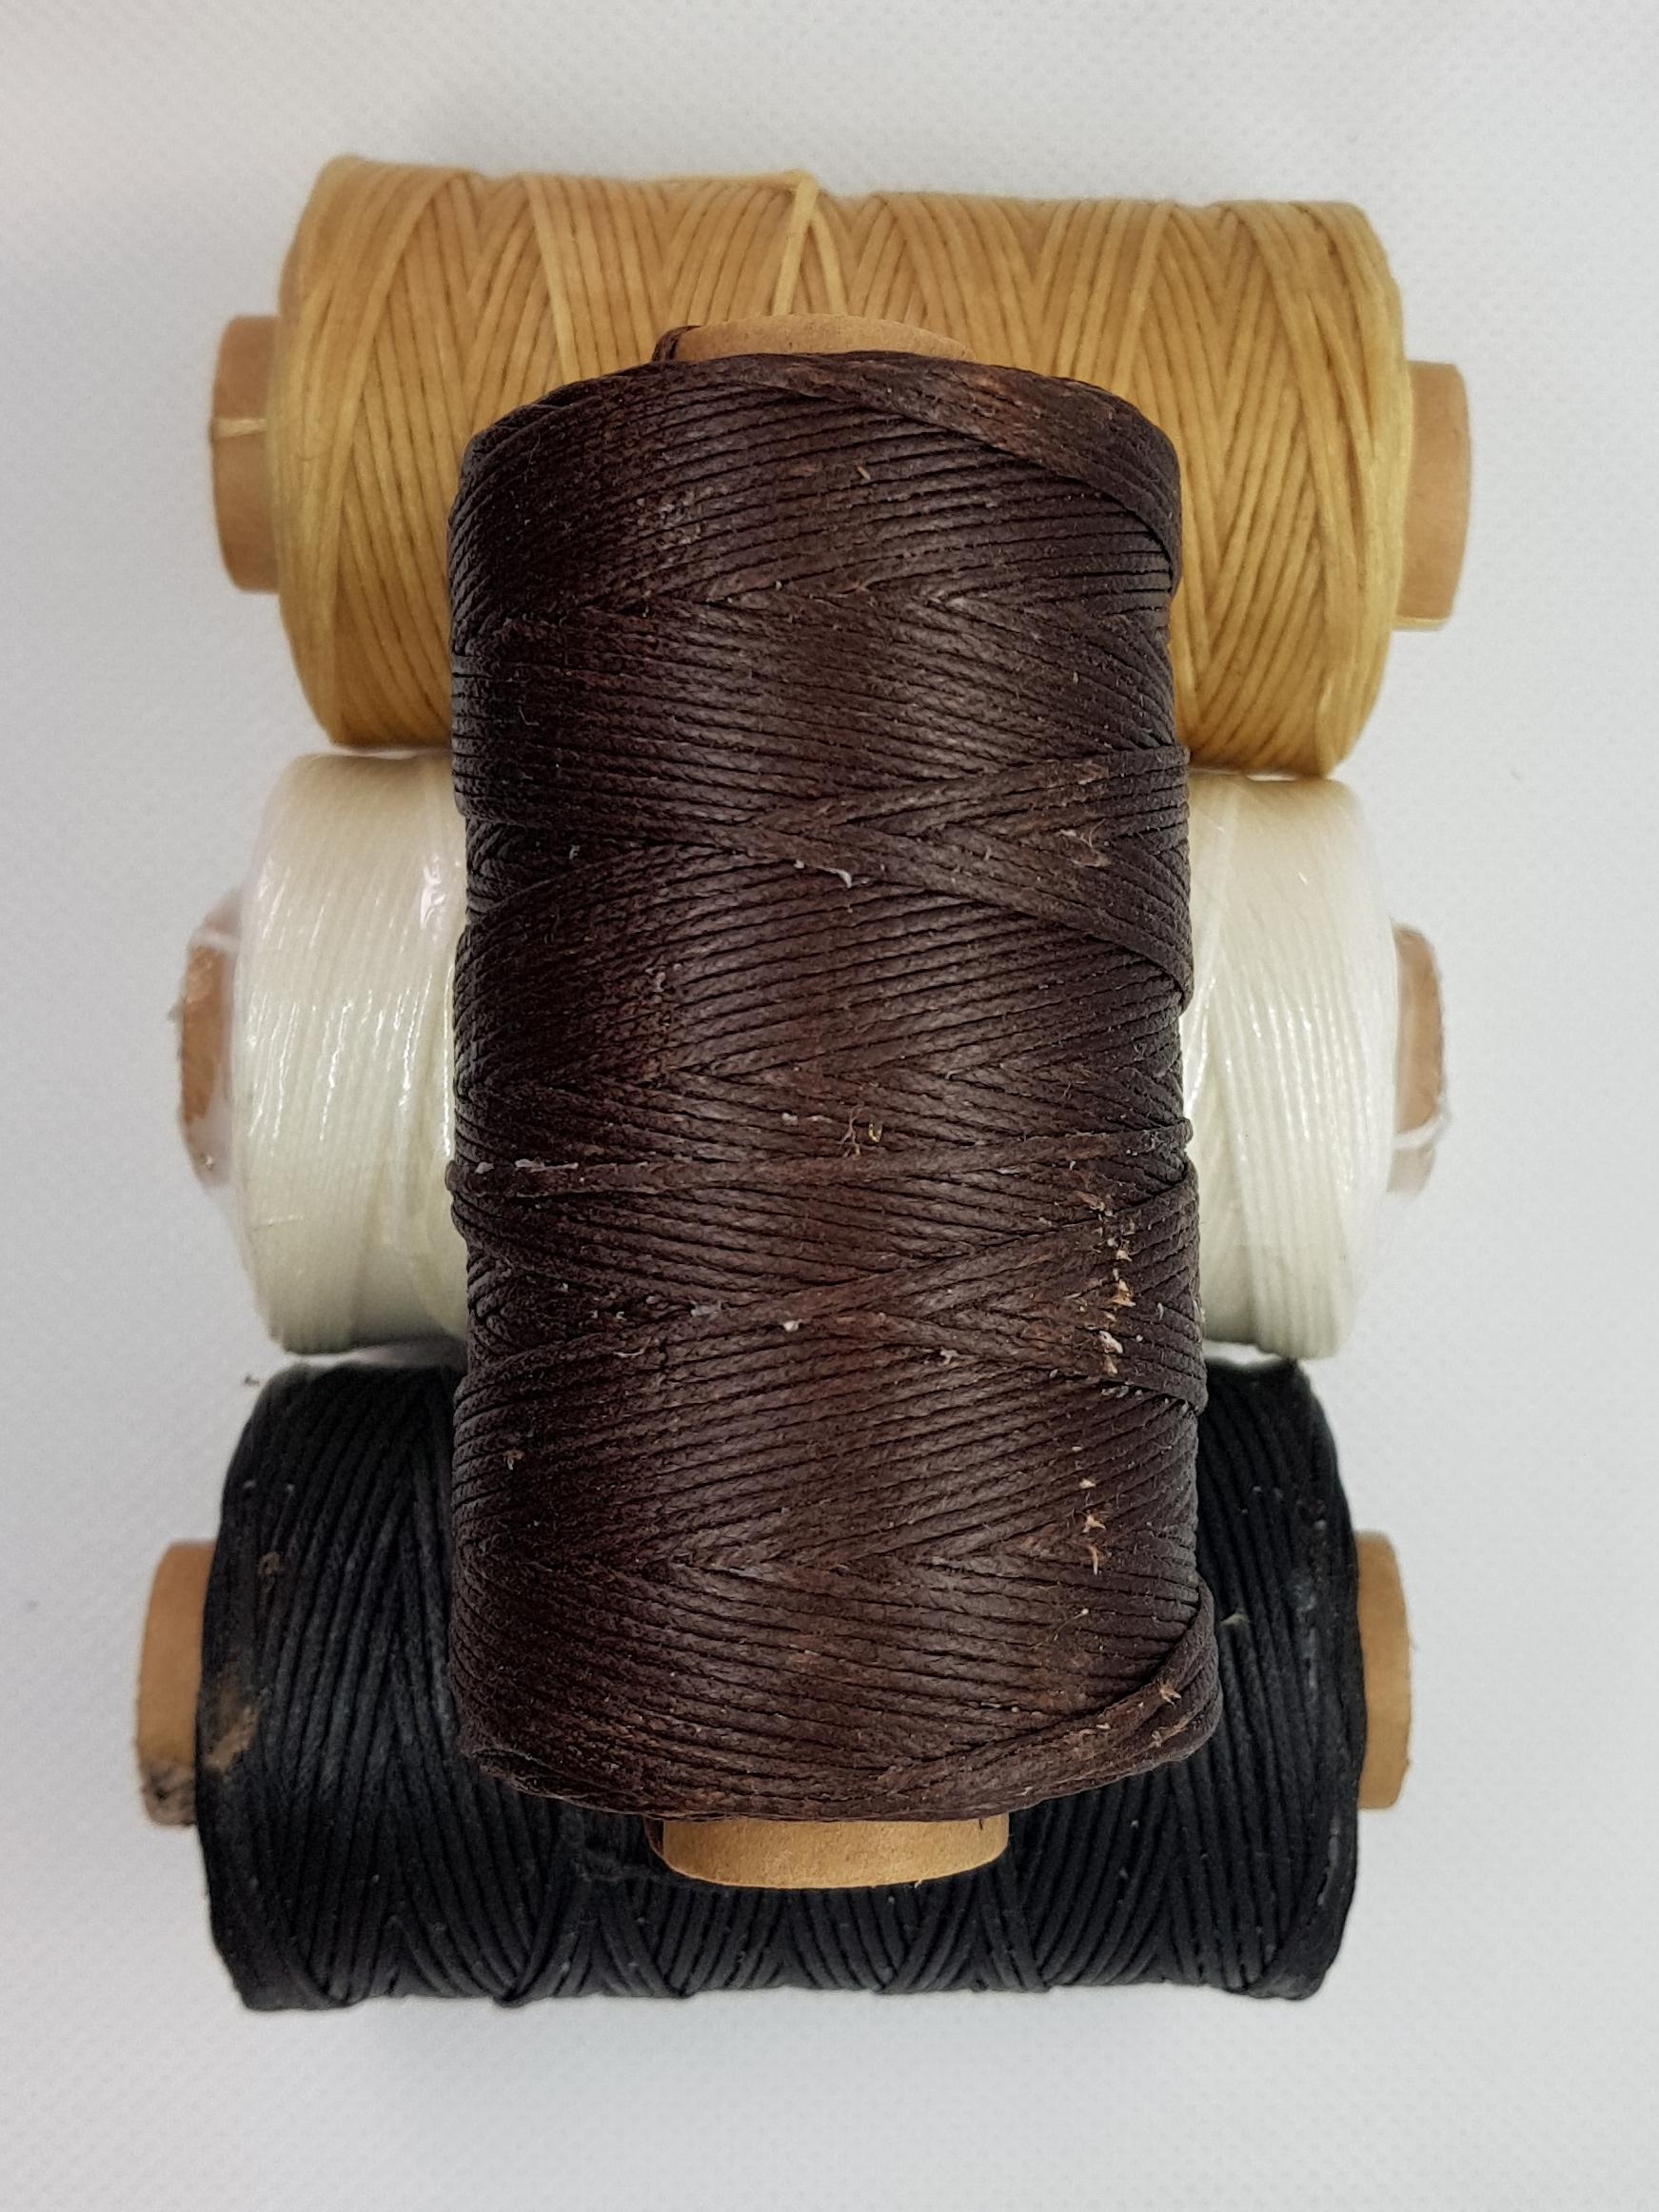 fil nylon poisse pour couture main